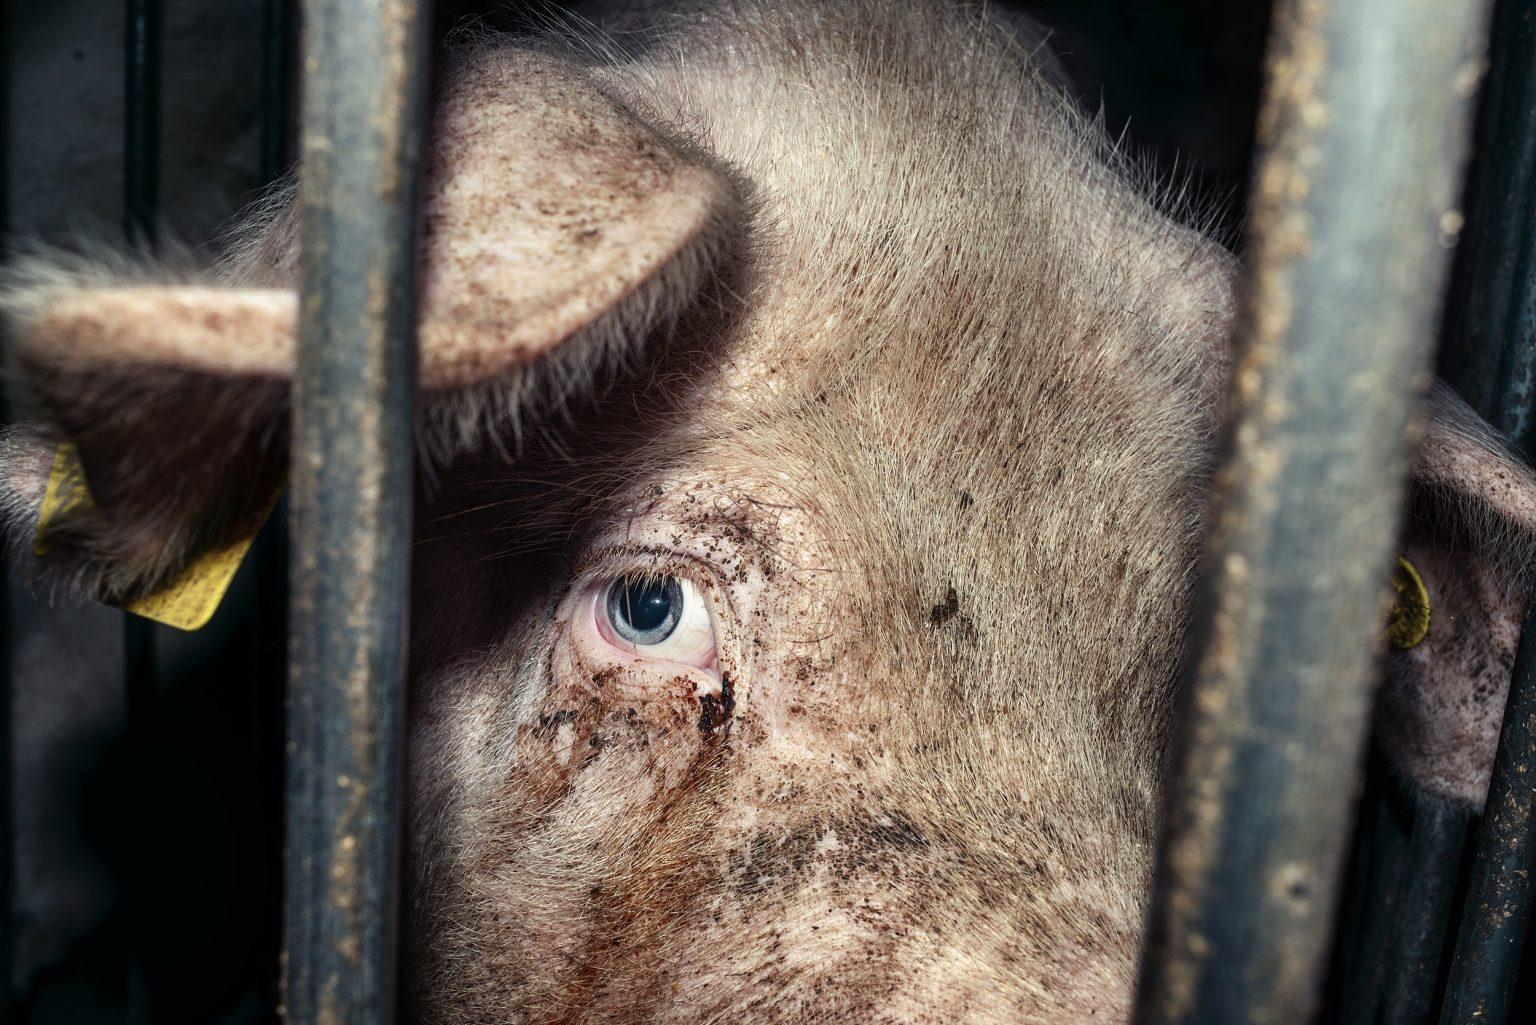 A sow in a gestation cage. Emilia Romagna. November 2016.  Una scrofa in una gabbia di gestazione. Emilia Romagna. Novembre 2016.